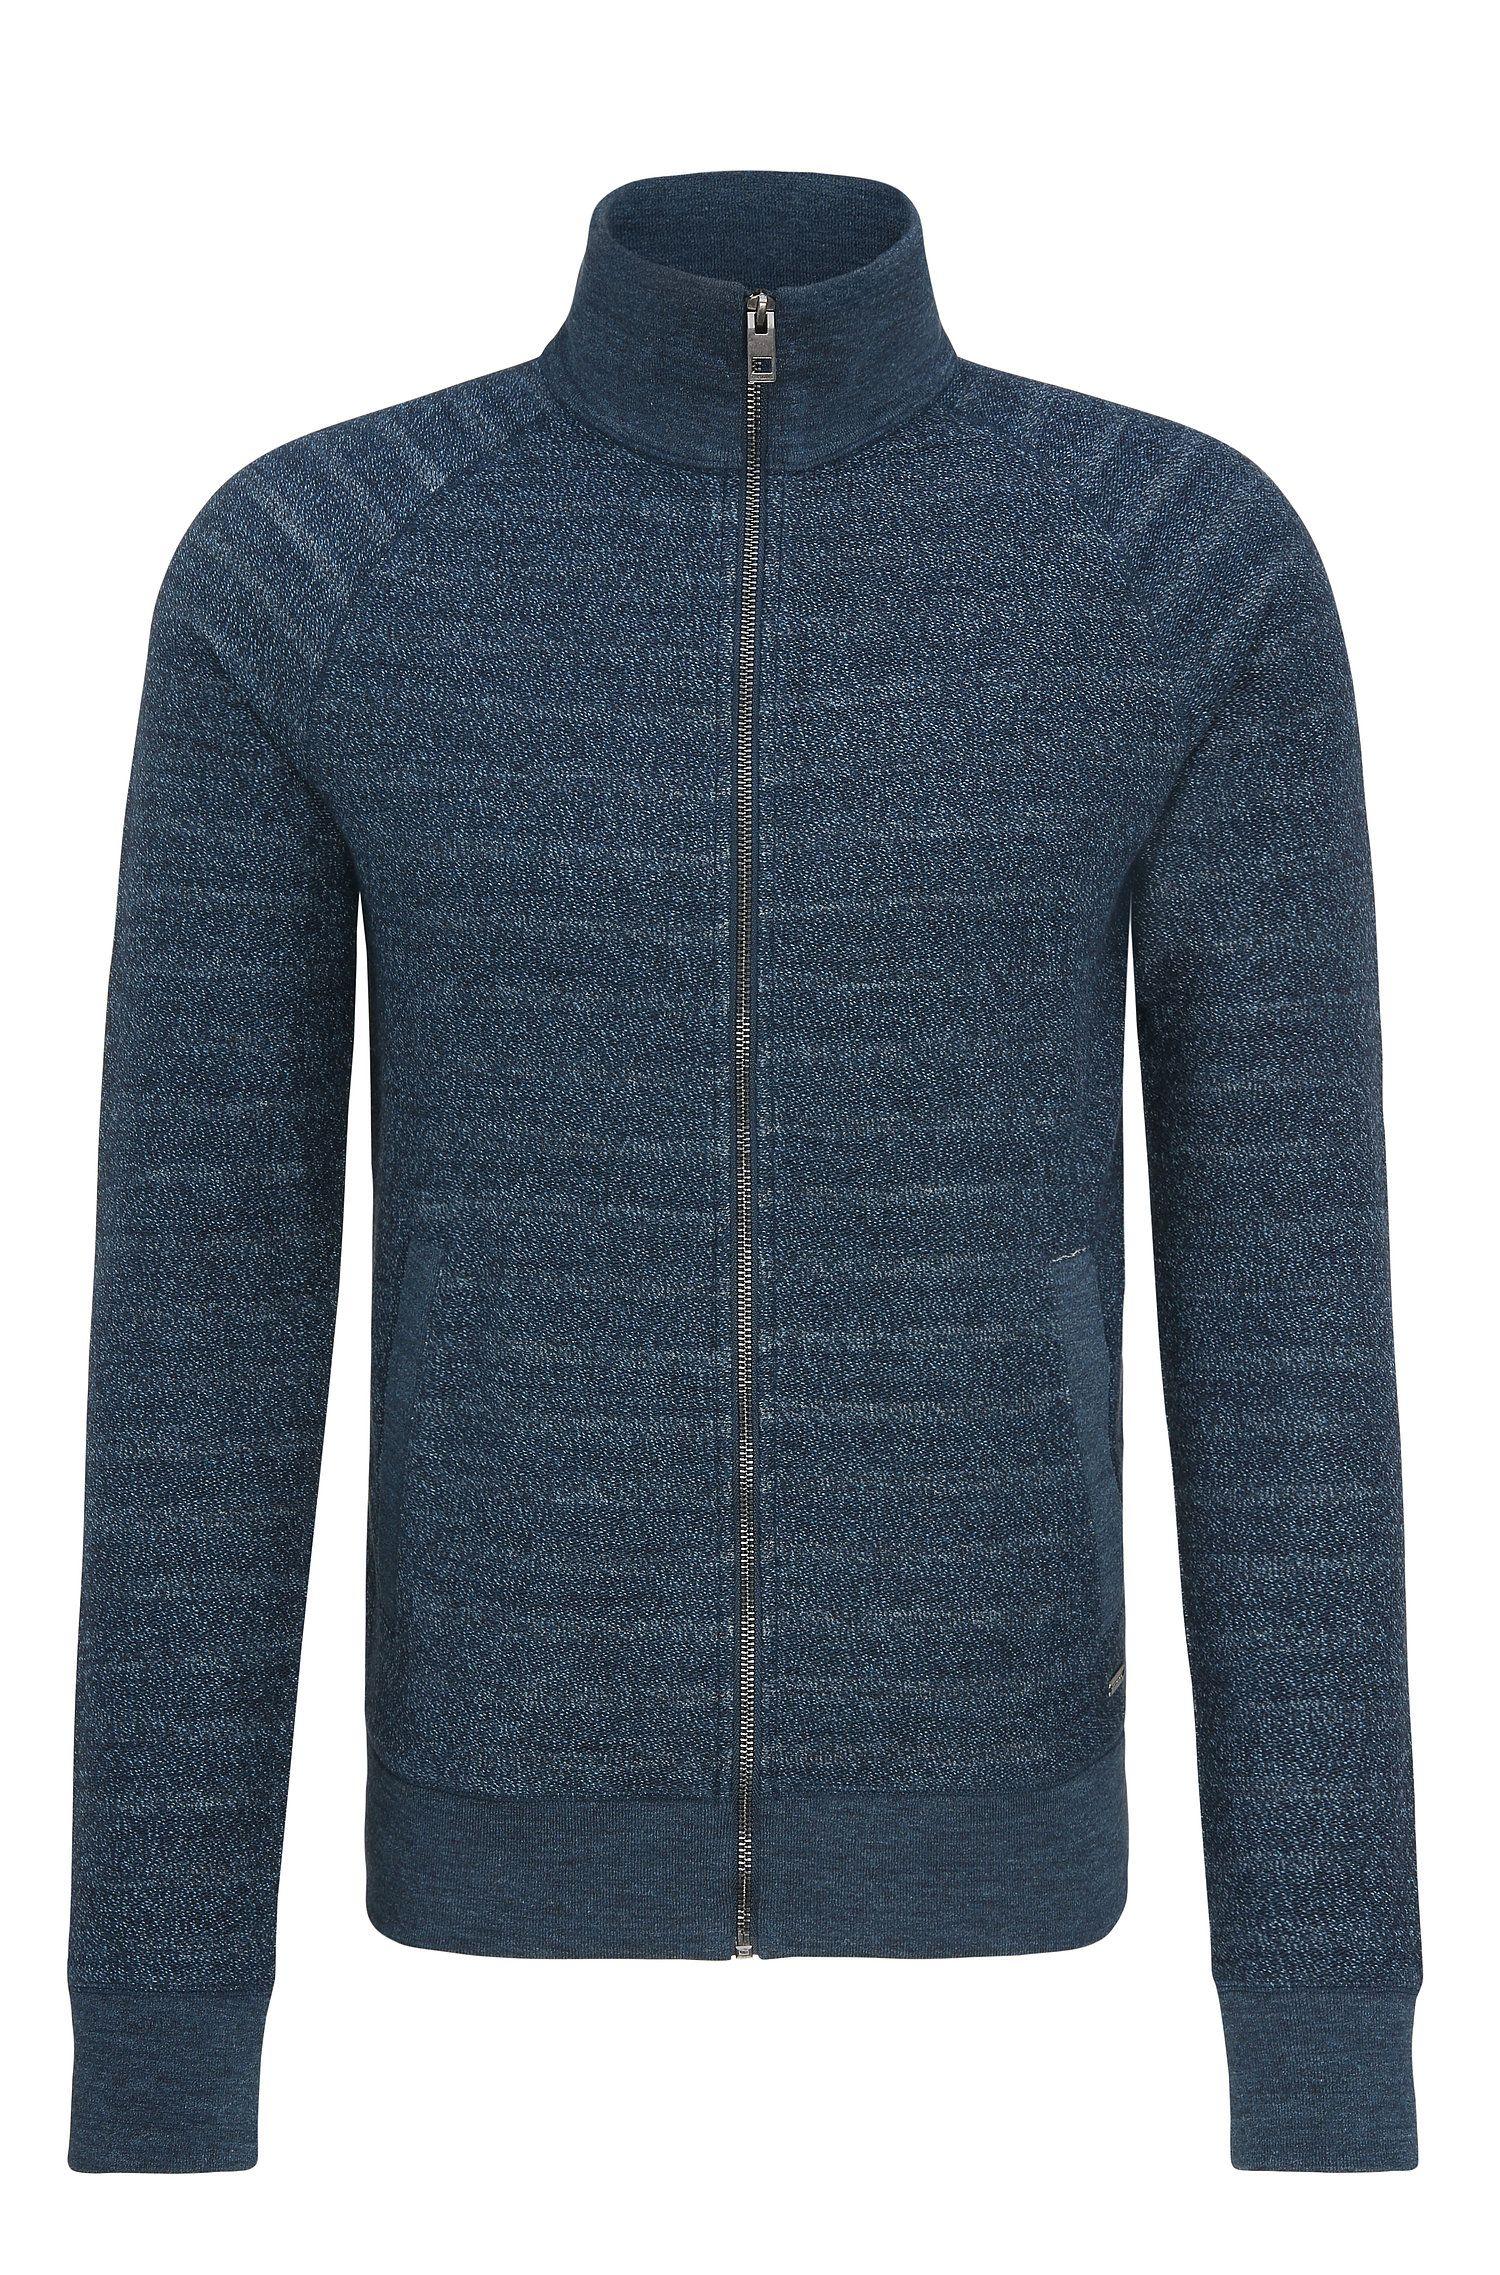 'Zlate' | Melange Cotton Full-Zip Sweater